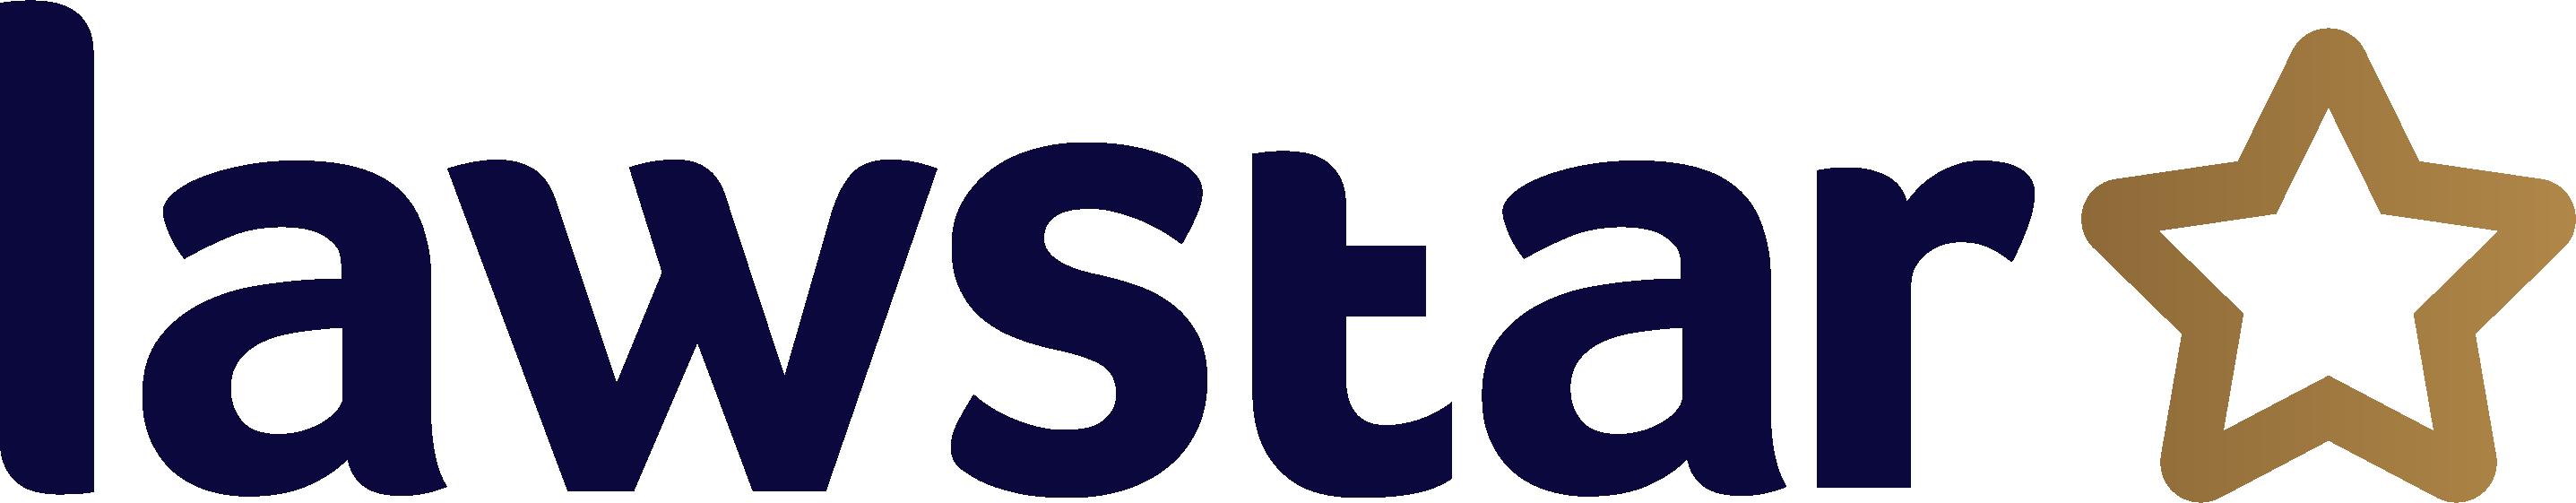 Lawstar logo